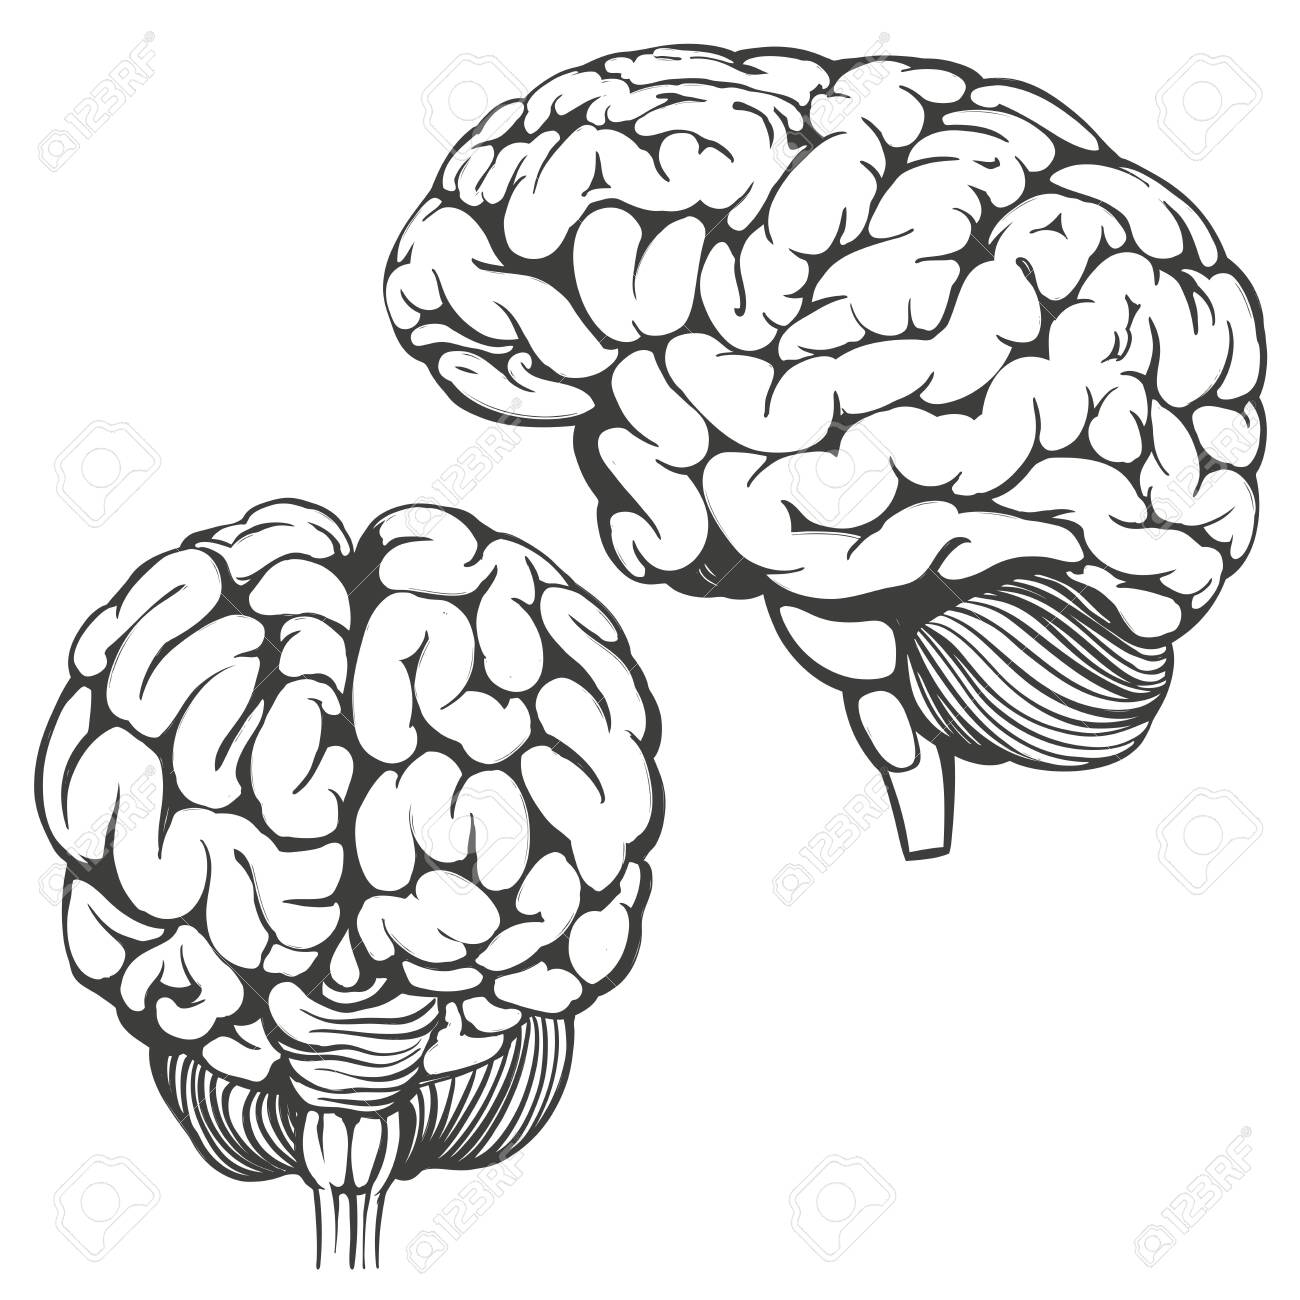 brains collection, human anatomy, icon cartoon hand drawn vector illustration sketch. - 143740124